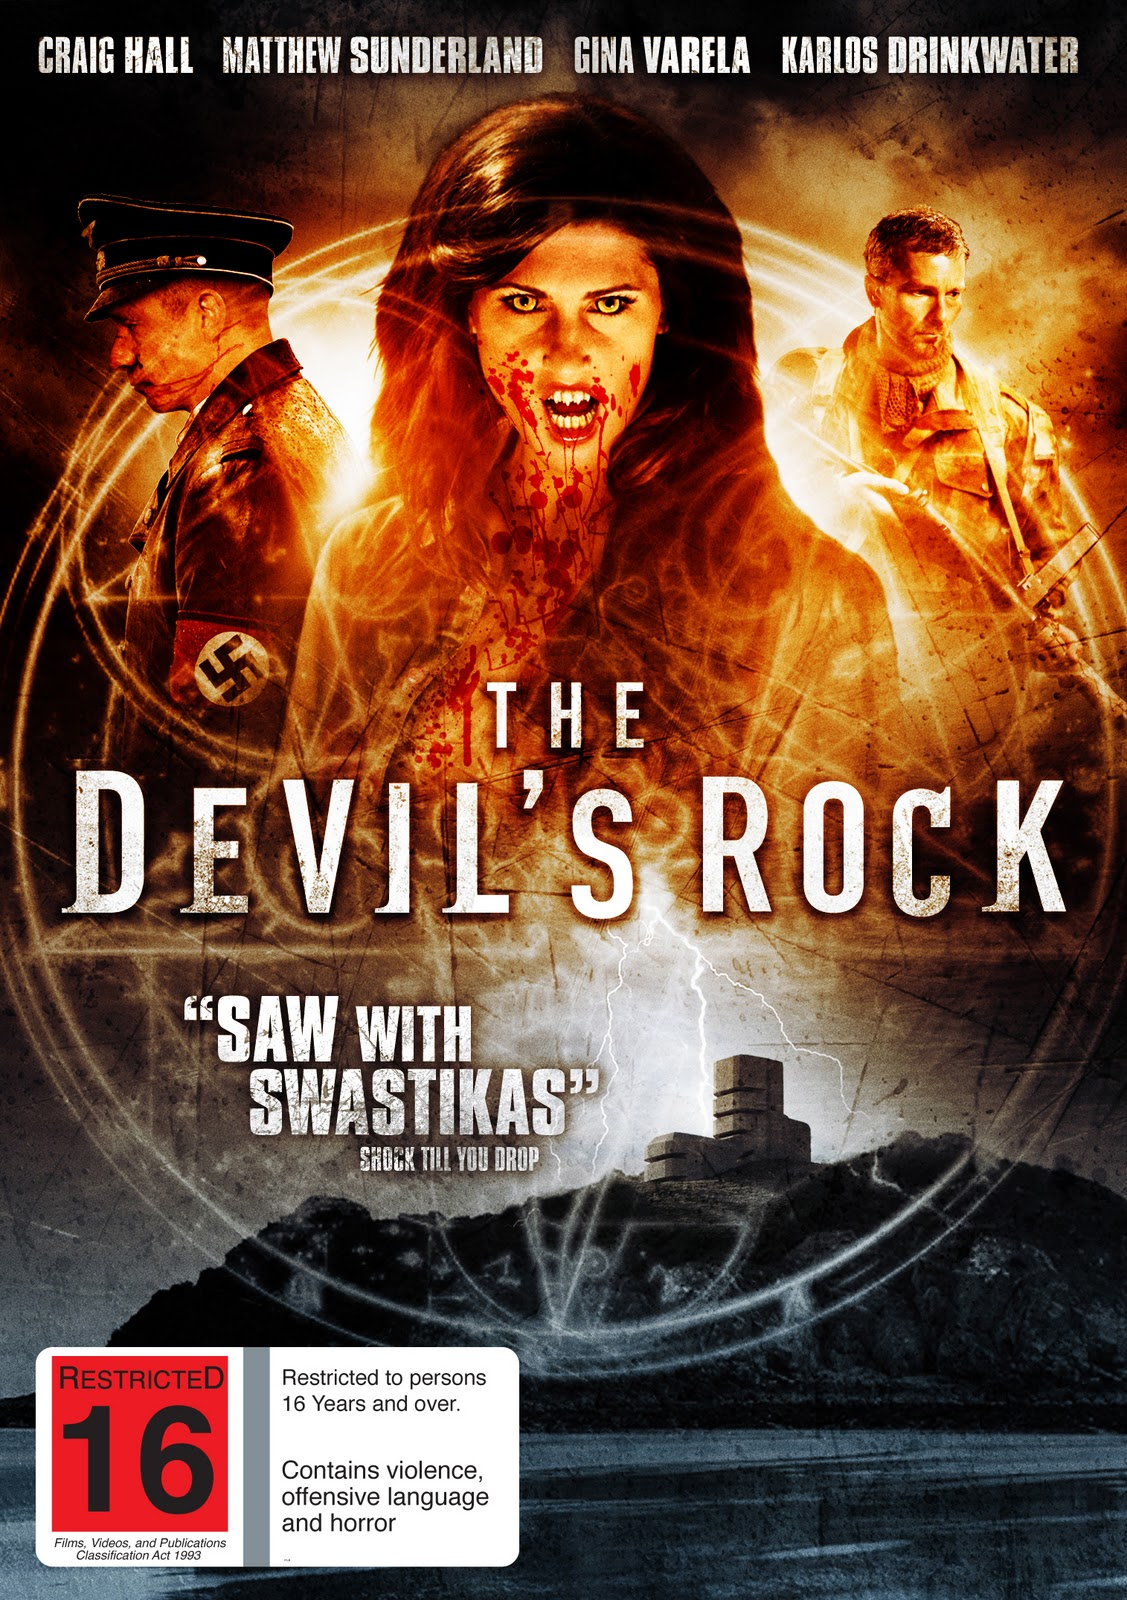 http://1.bp.blogspot.com/-oaOFggDZoYk/TwpVO4LPS9I/AAAAAAAAADw/cSJ3dOcrGcw/s1600/The%2BDevils%2BRock_DVD%2Brated.jpg